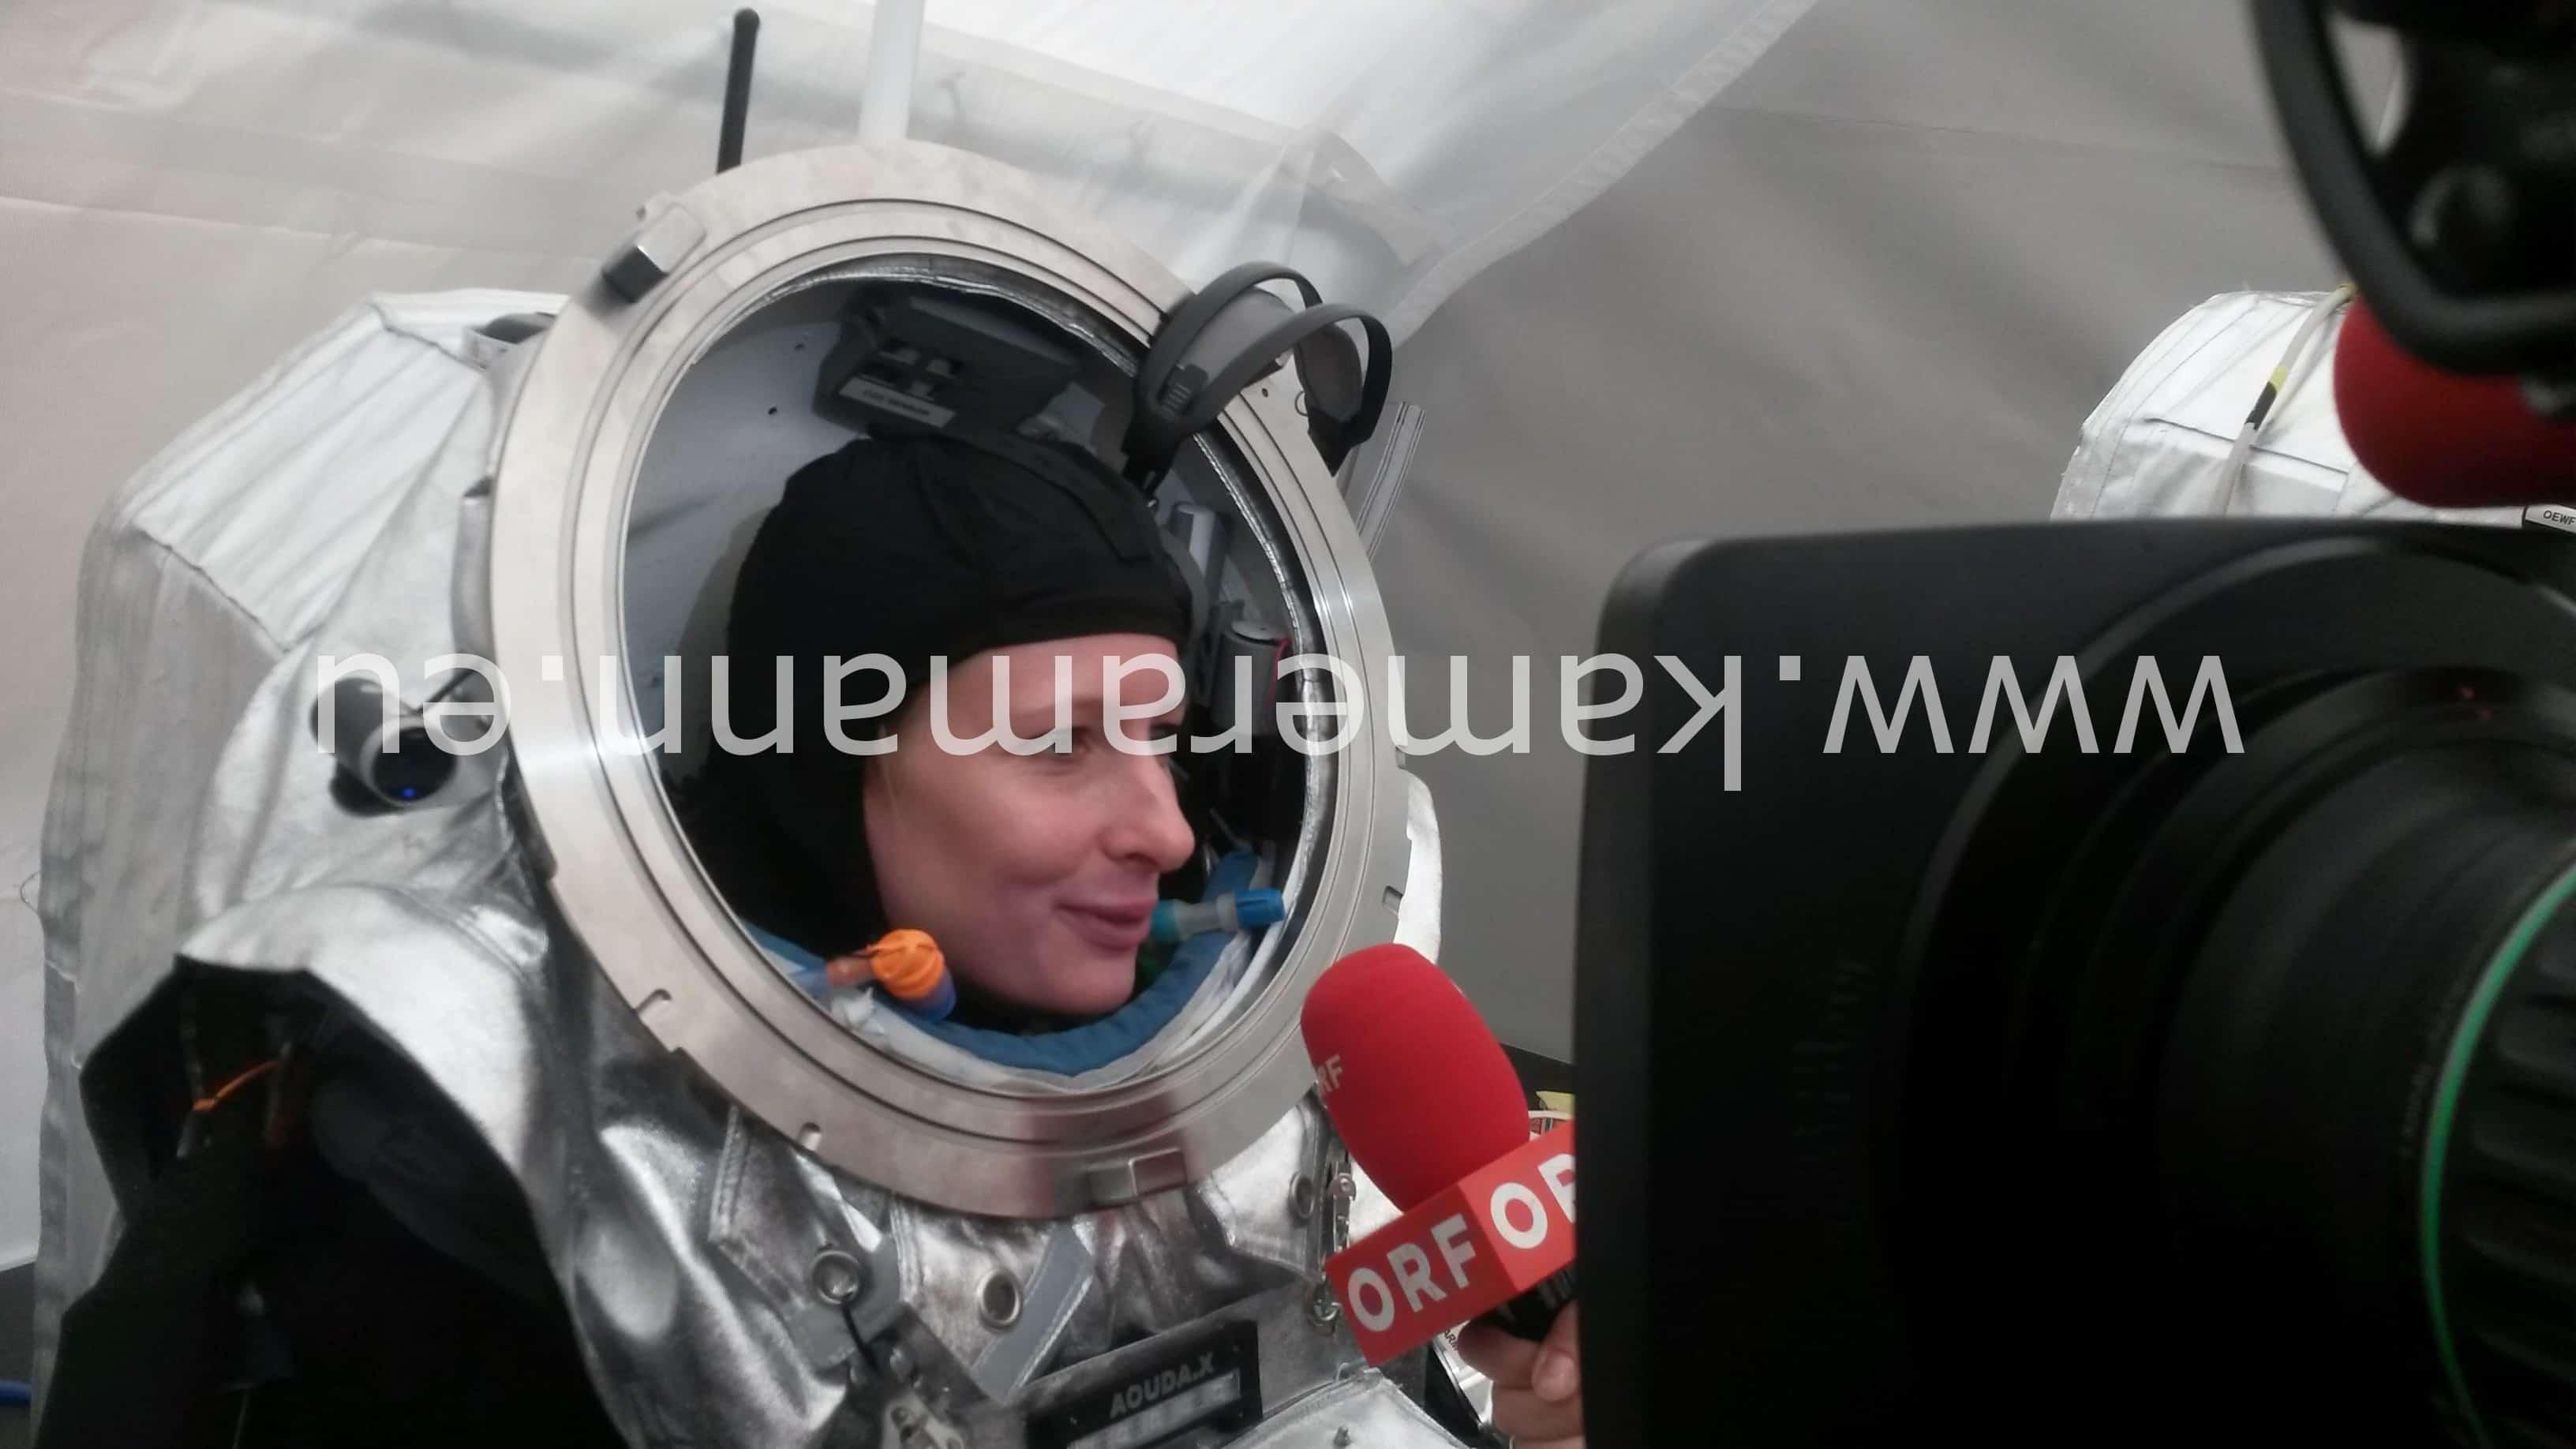 wpid 20150803 111800 e1438634634316 - ORF - Mars Simulation